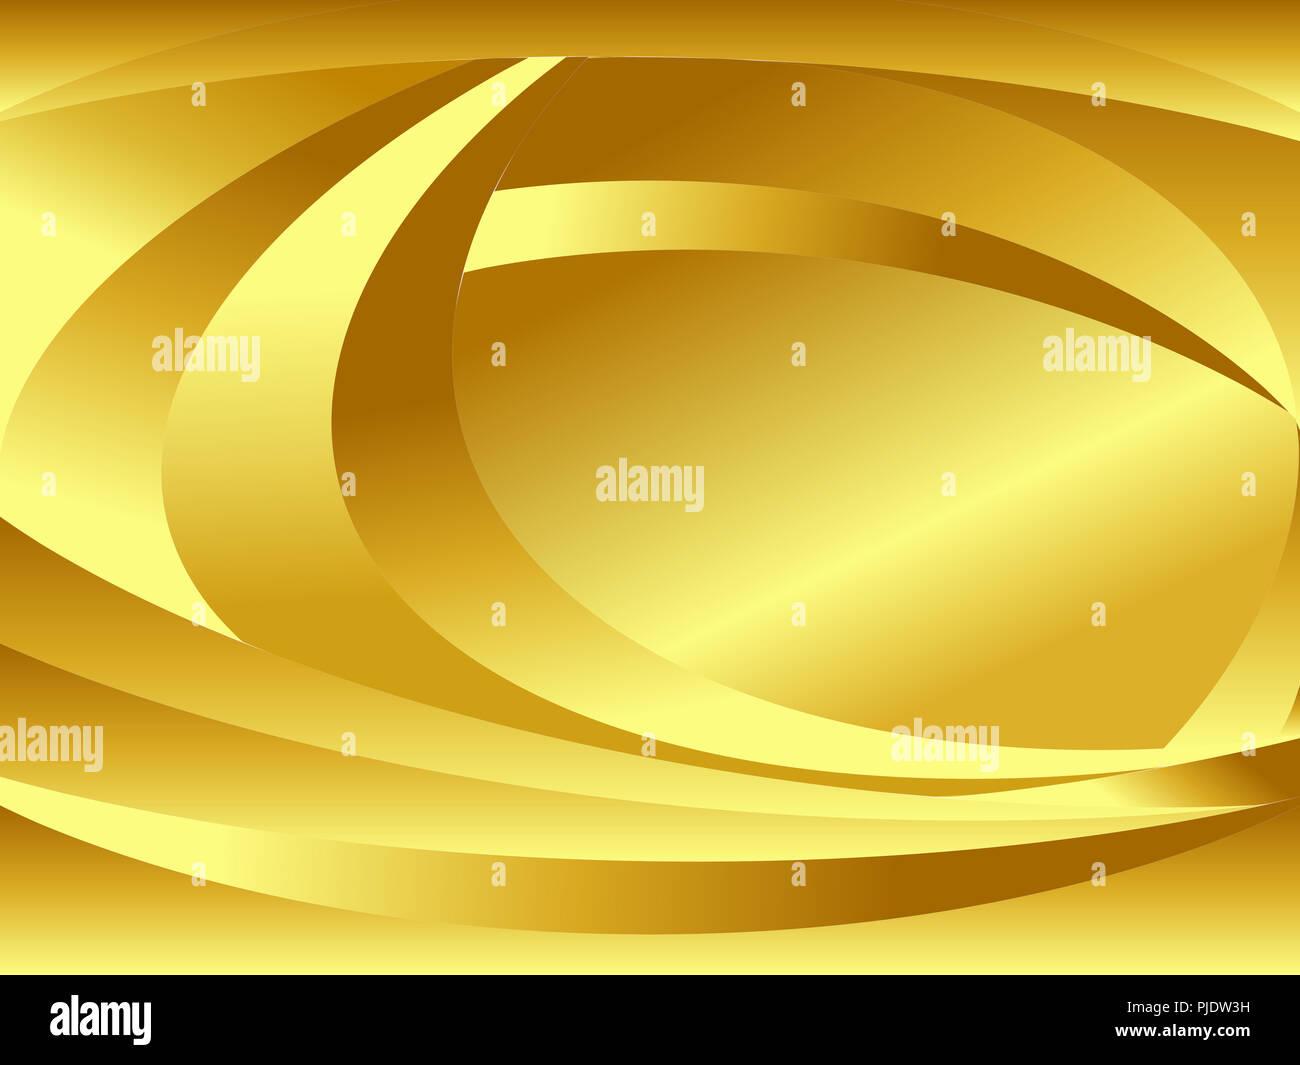 abstract desktop backgrounds.html